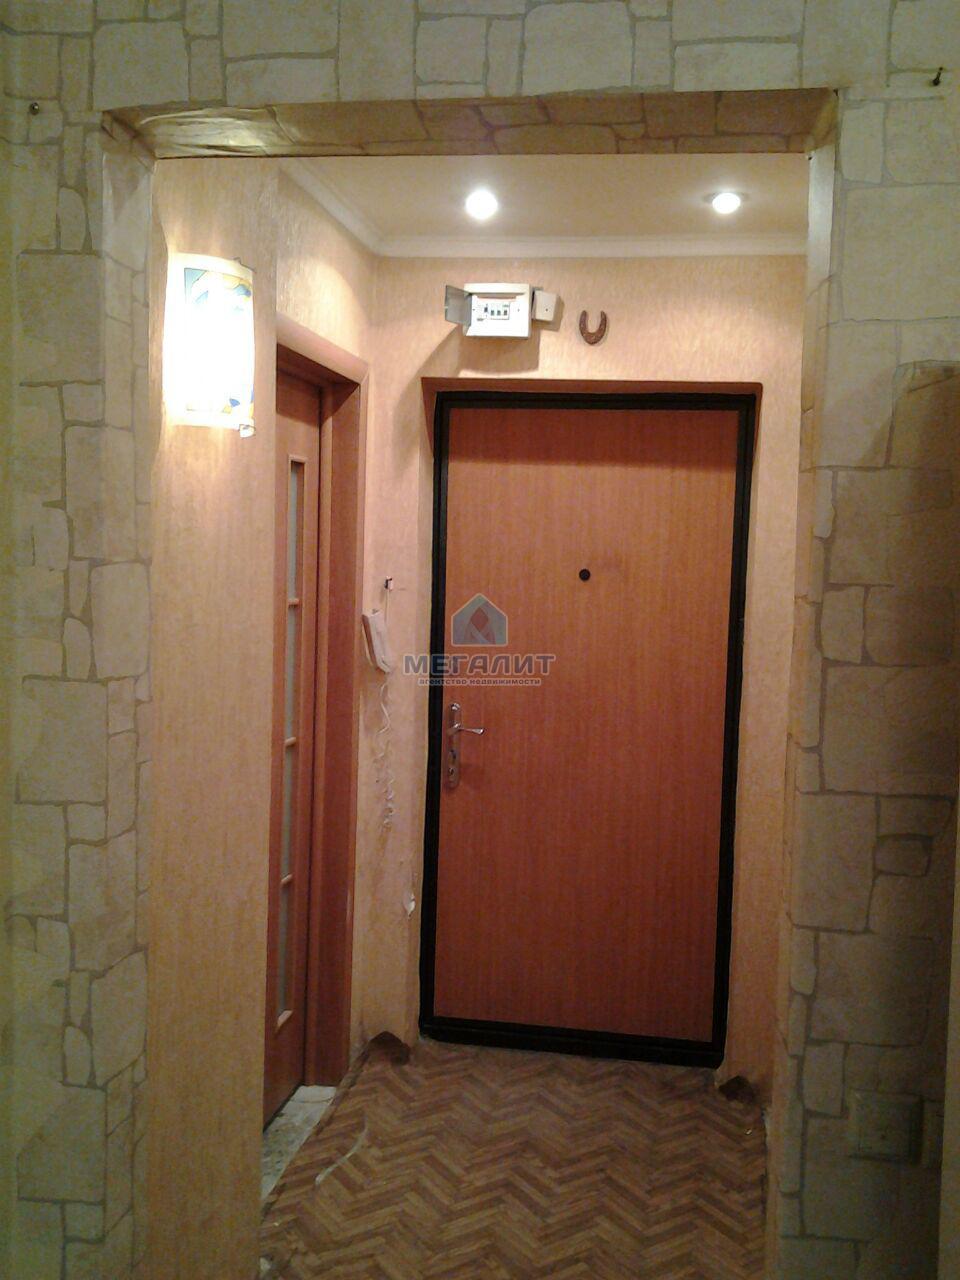 Аренда 1-к квартиры Ямашева 31, 42.0 м² (миниатюра №1)